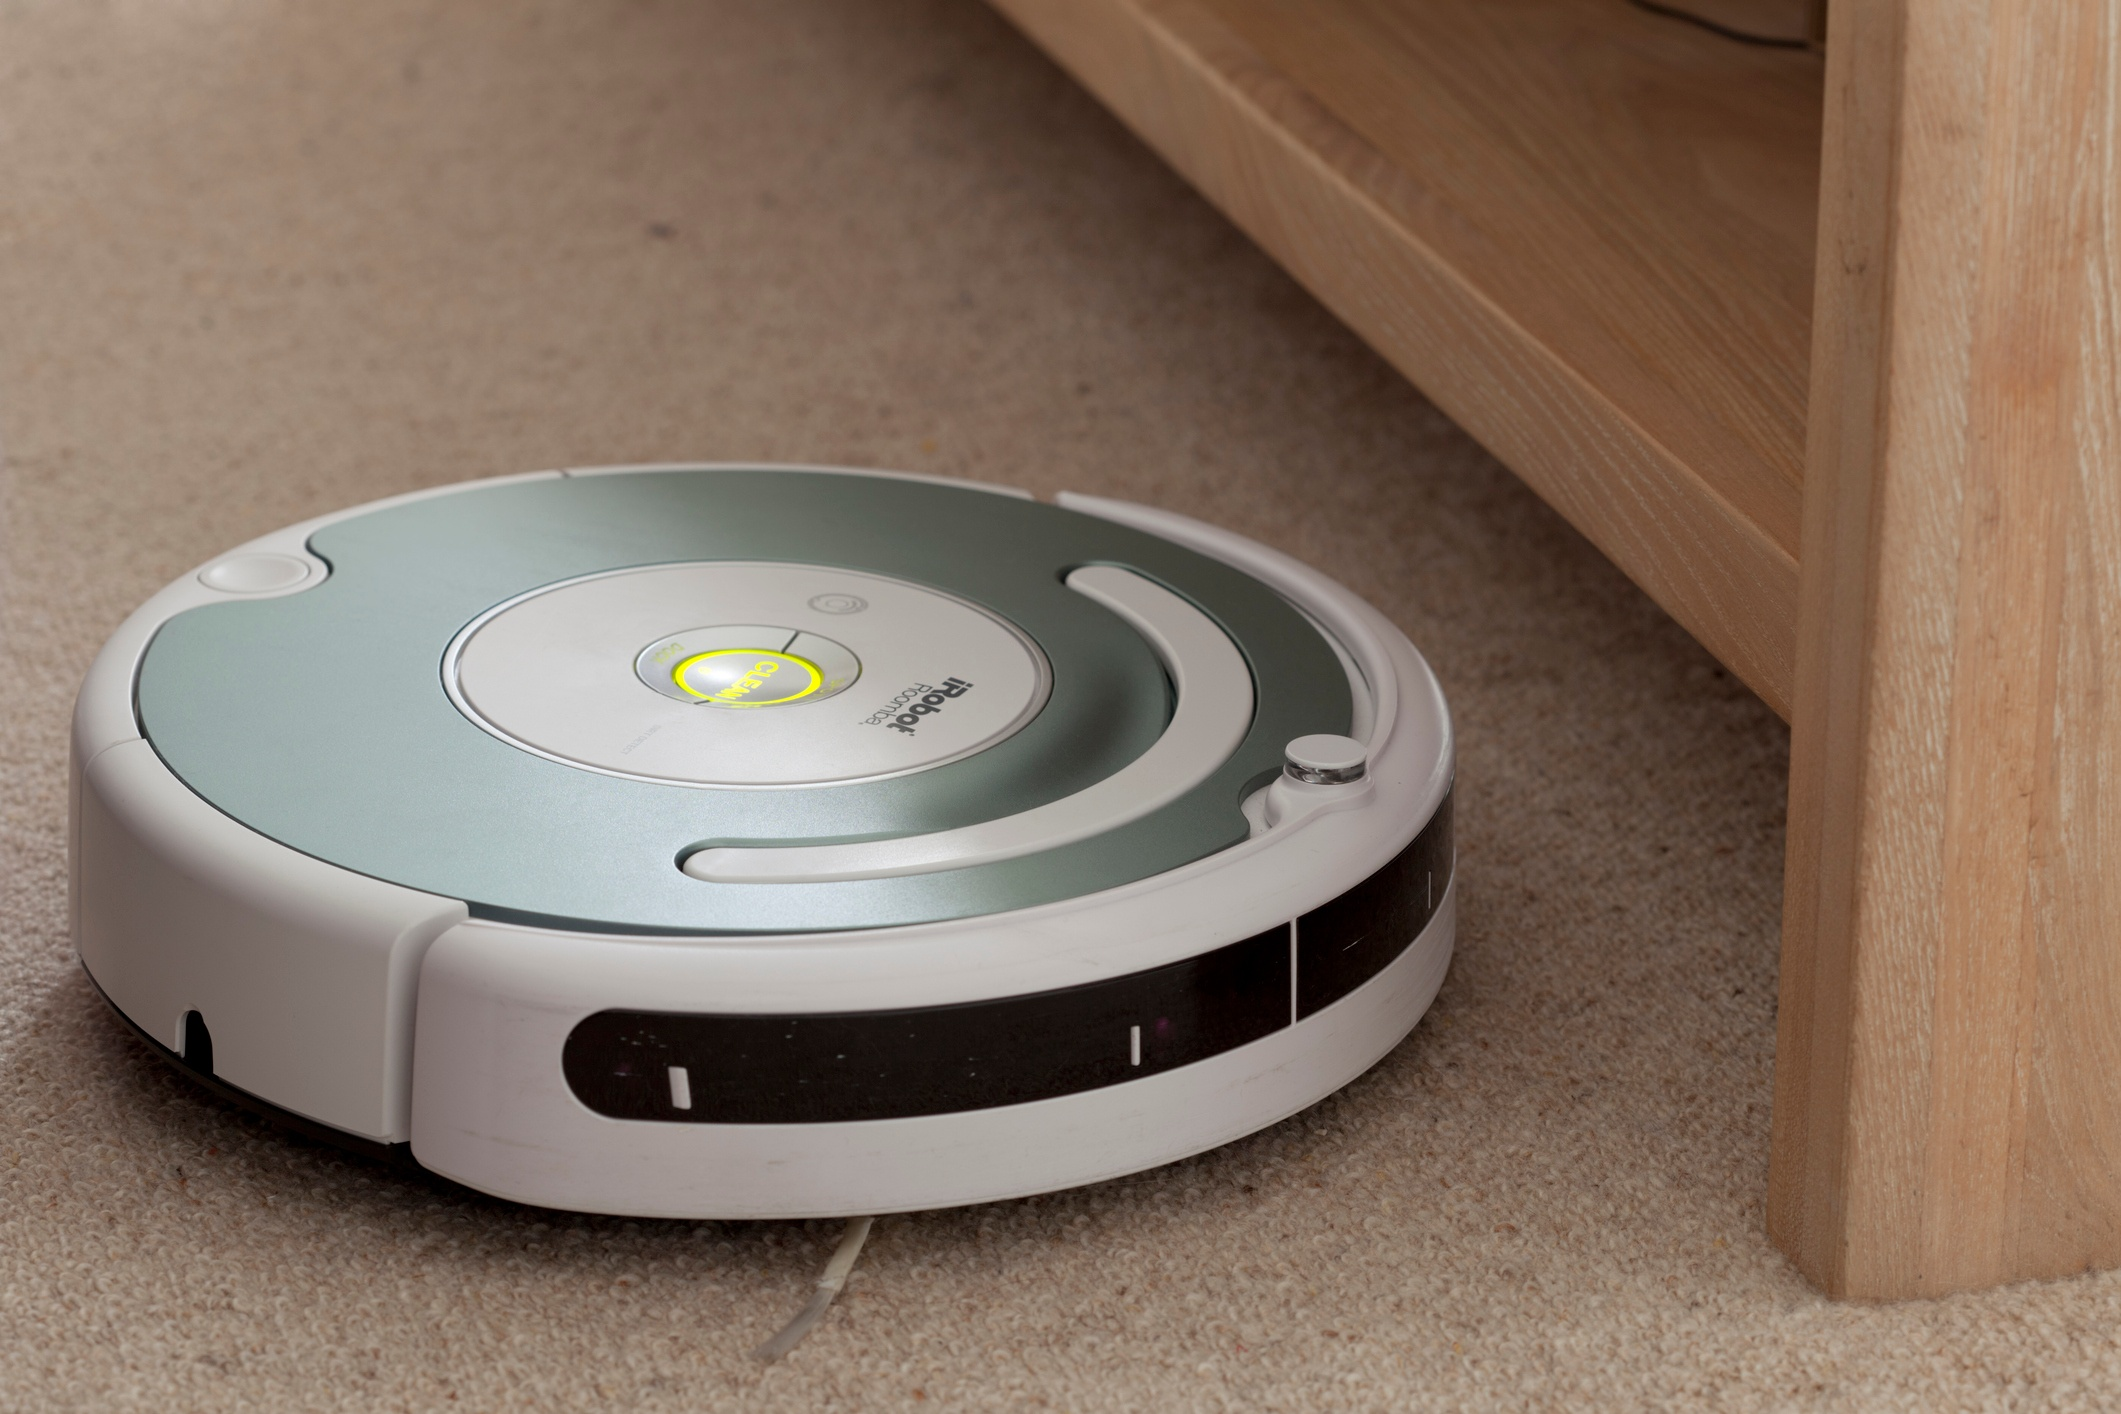 iRobot Roomba robot vacuum set to run at noon